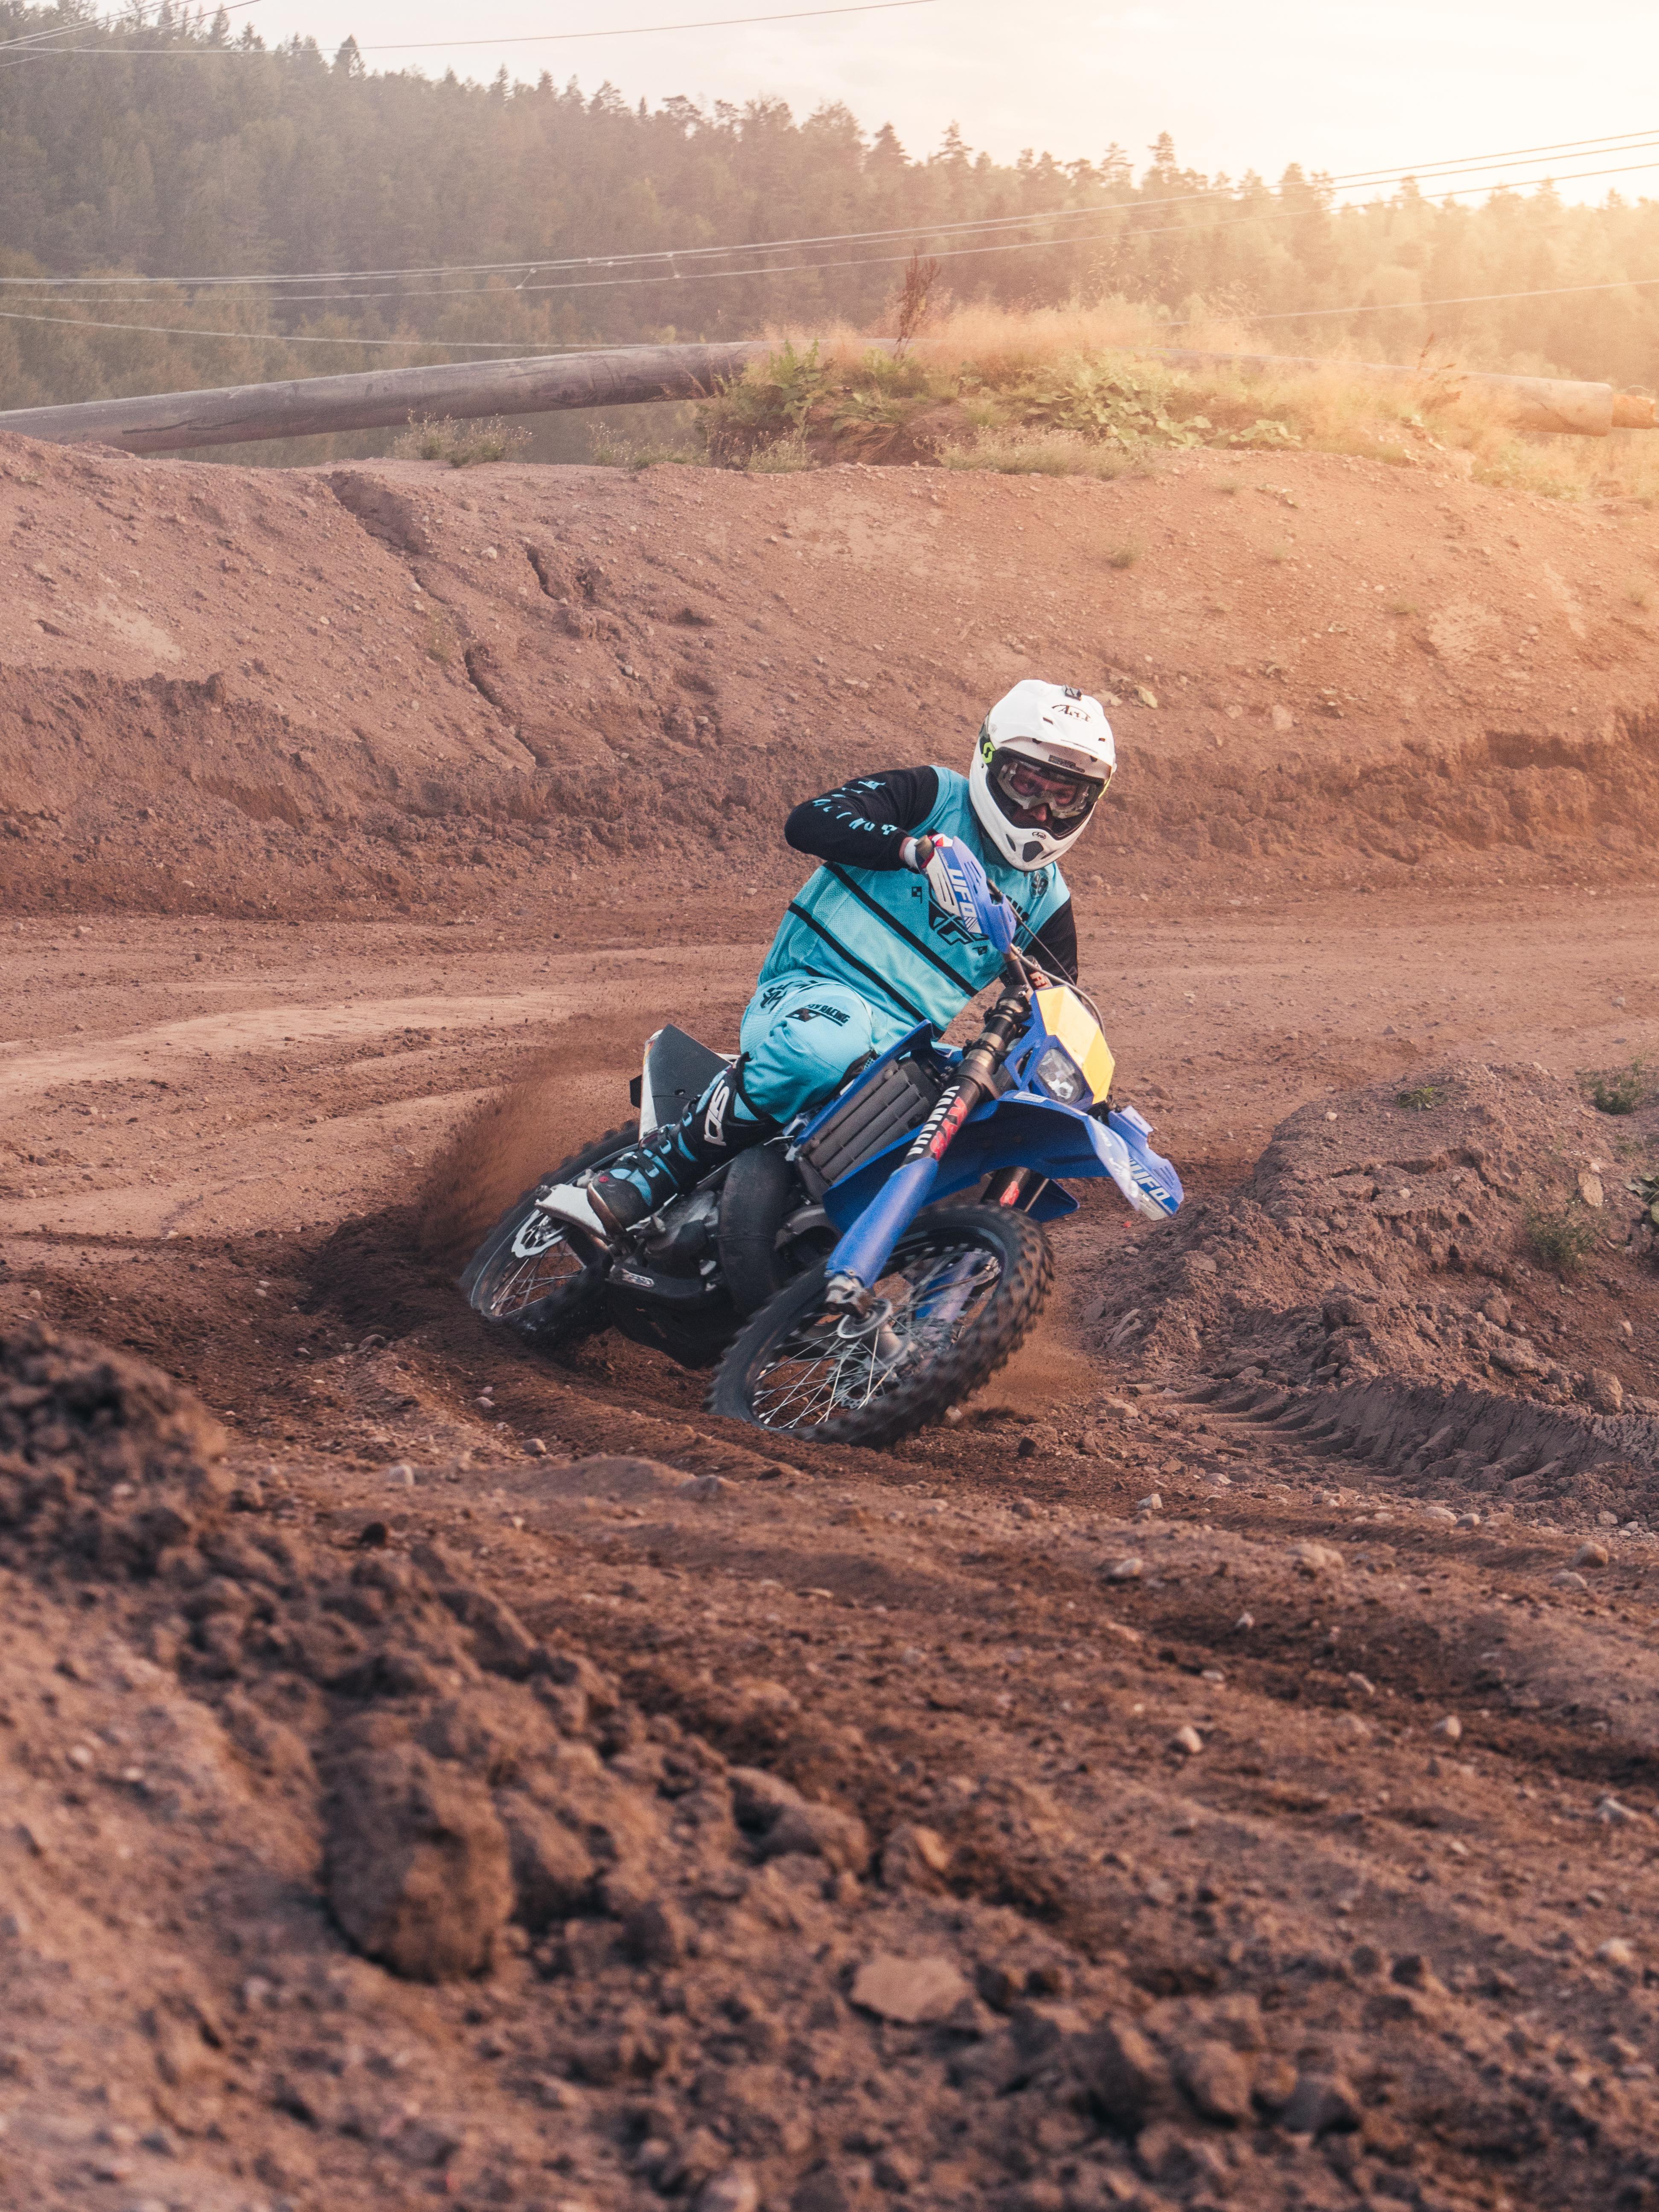 Person Riding on Motocross Dirt Bike